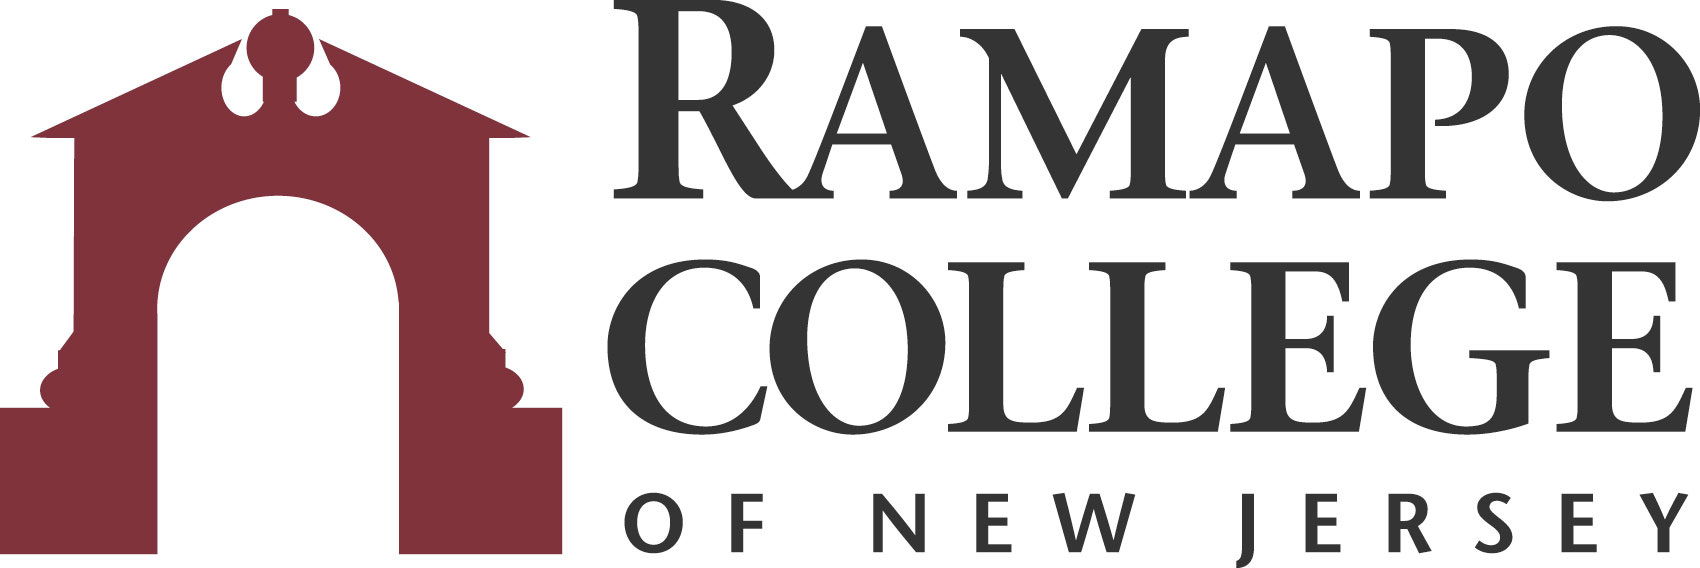 Ramapo Alumni